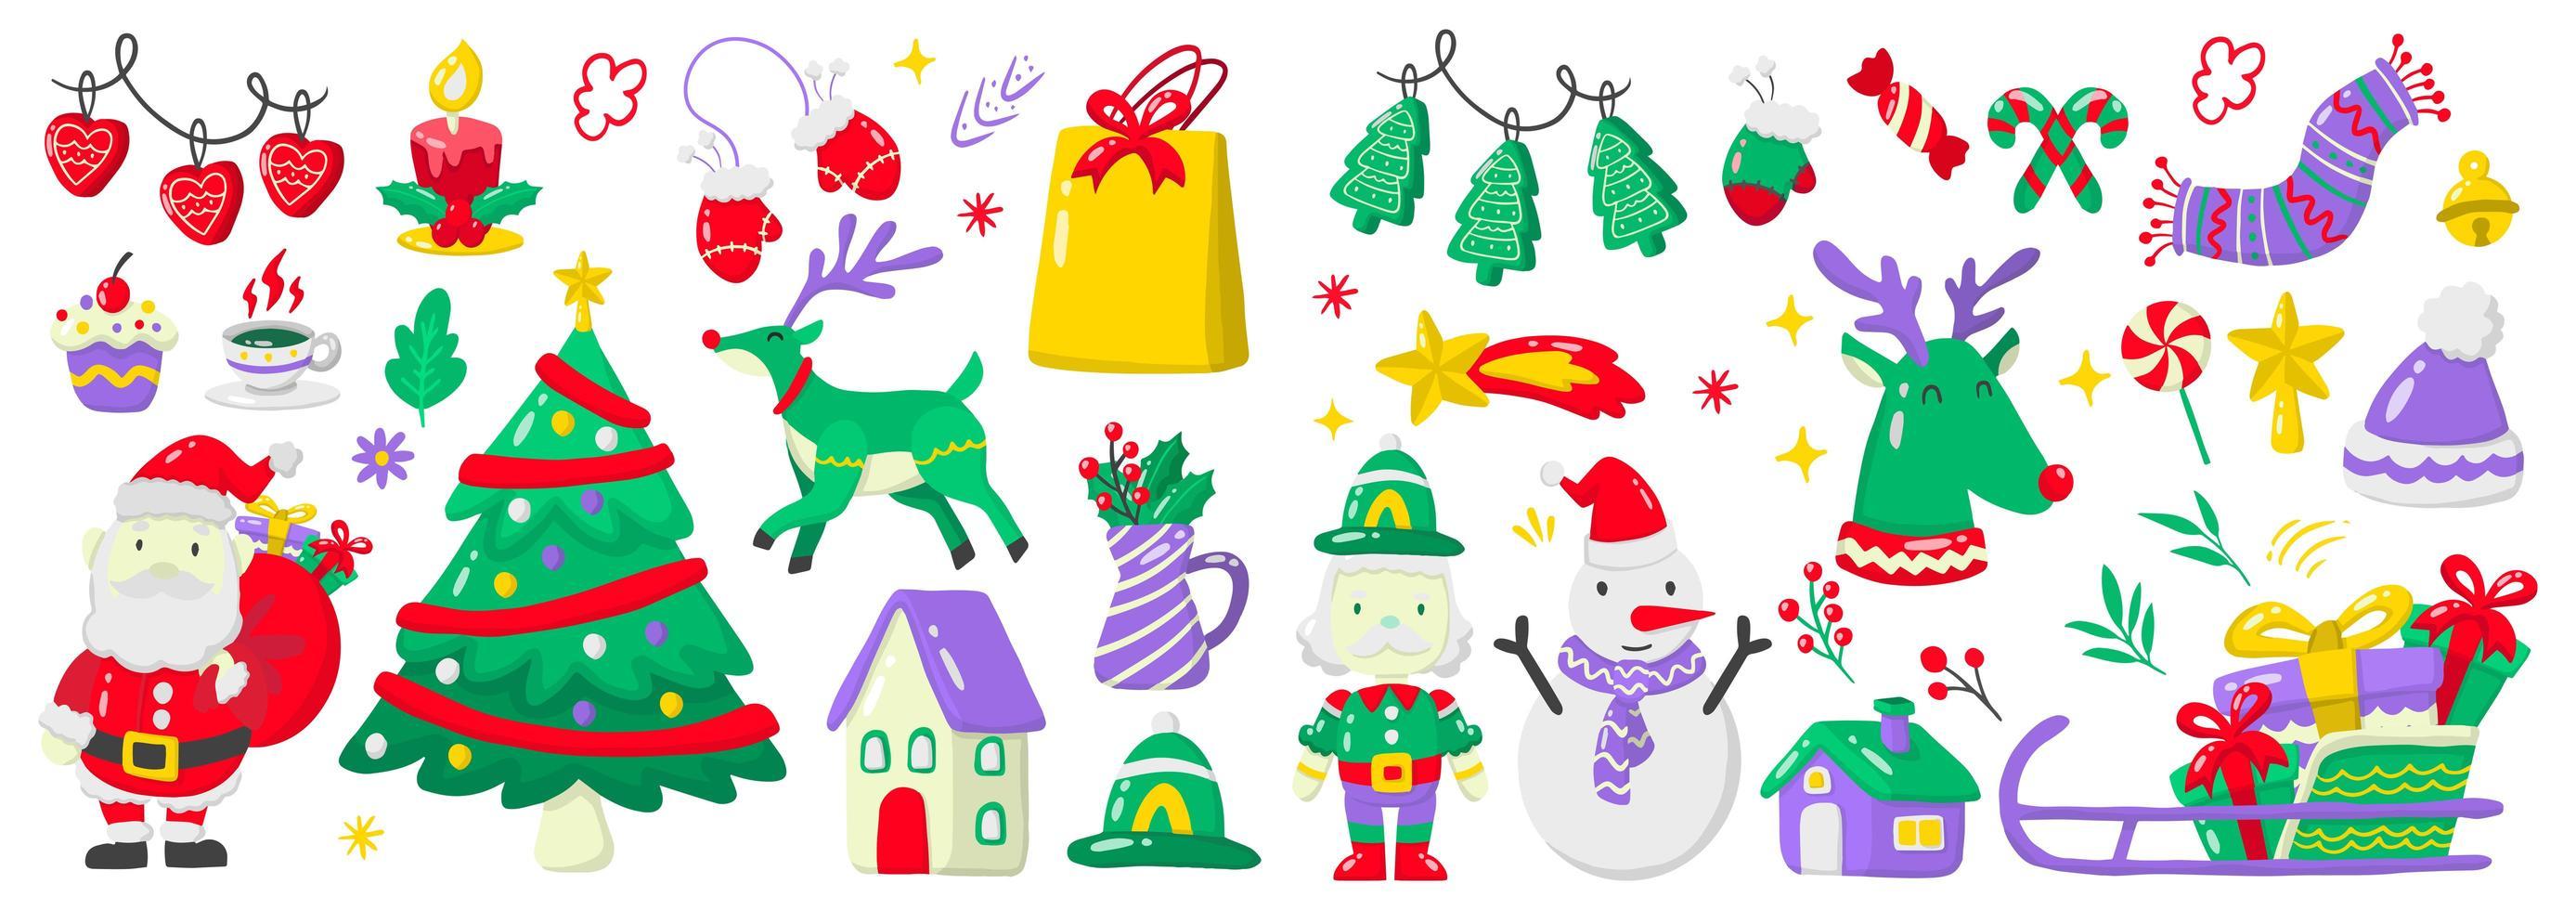 Christmas elements set vector